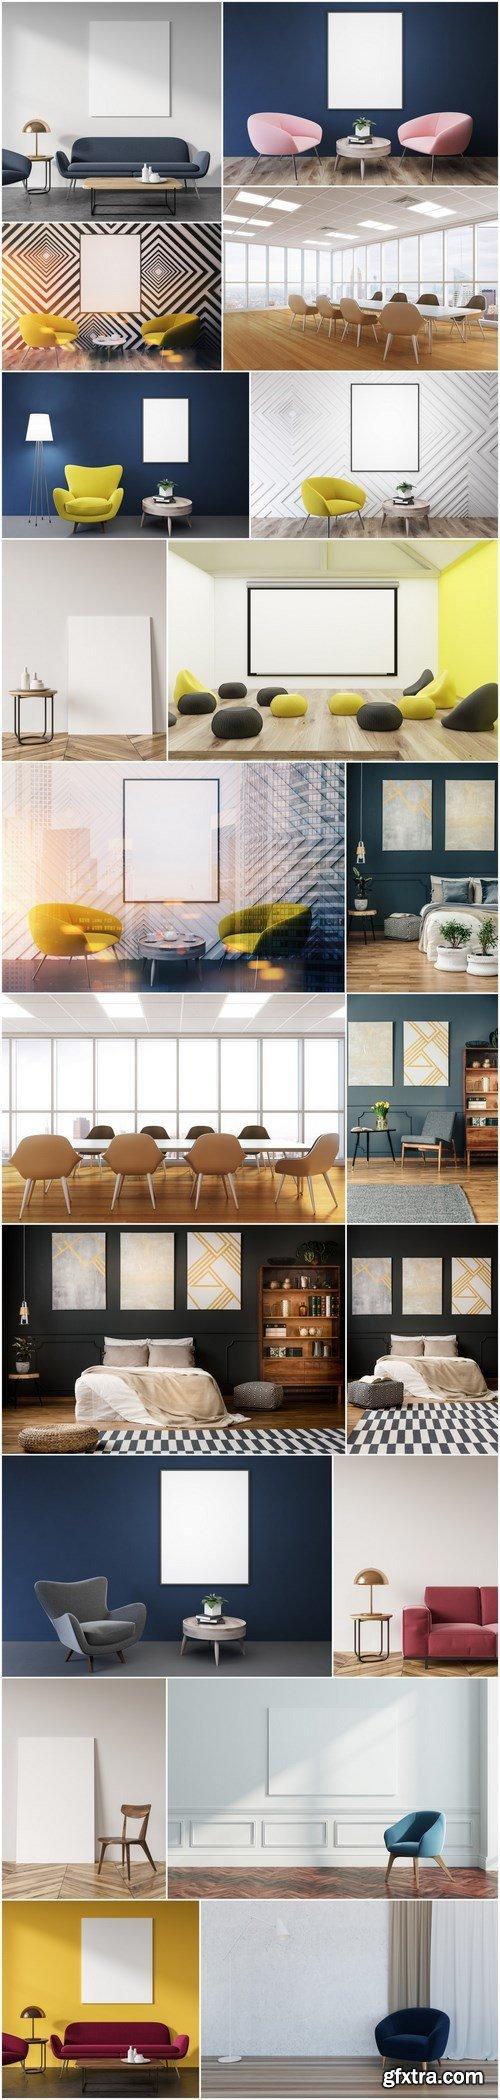 Modern interiors and cosiness 2 - 20xHQ JPEG